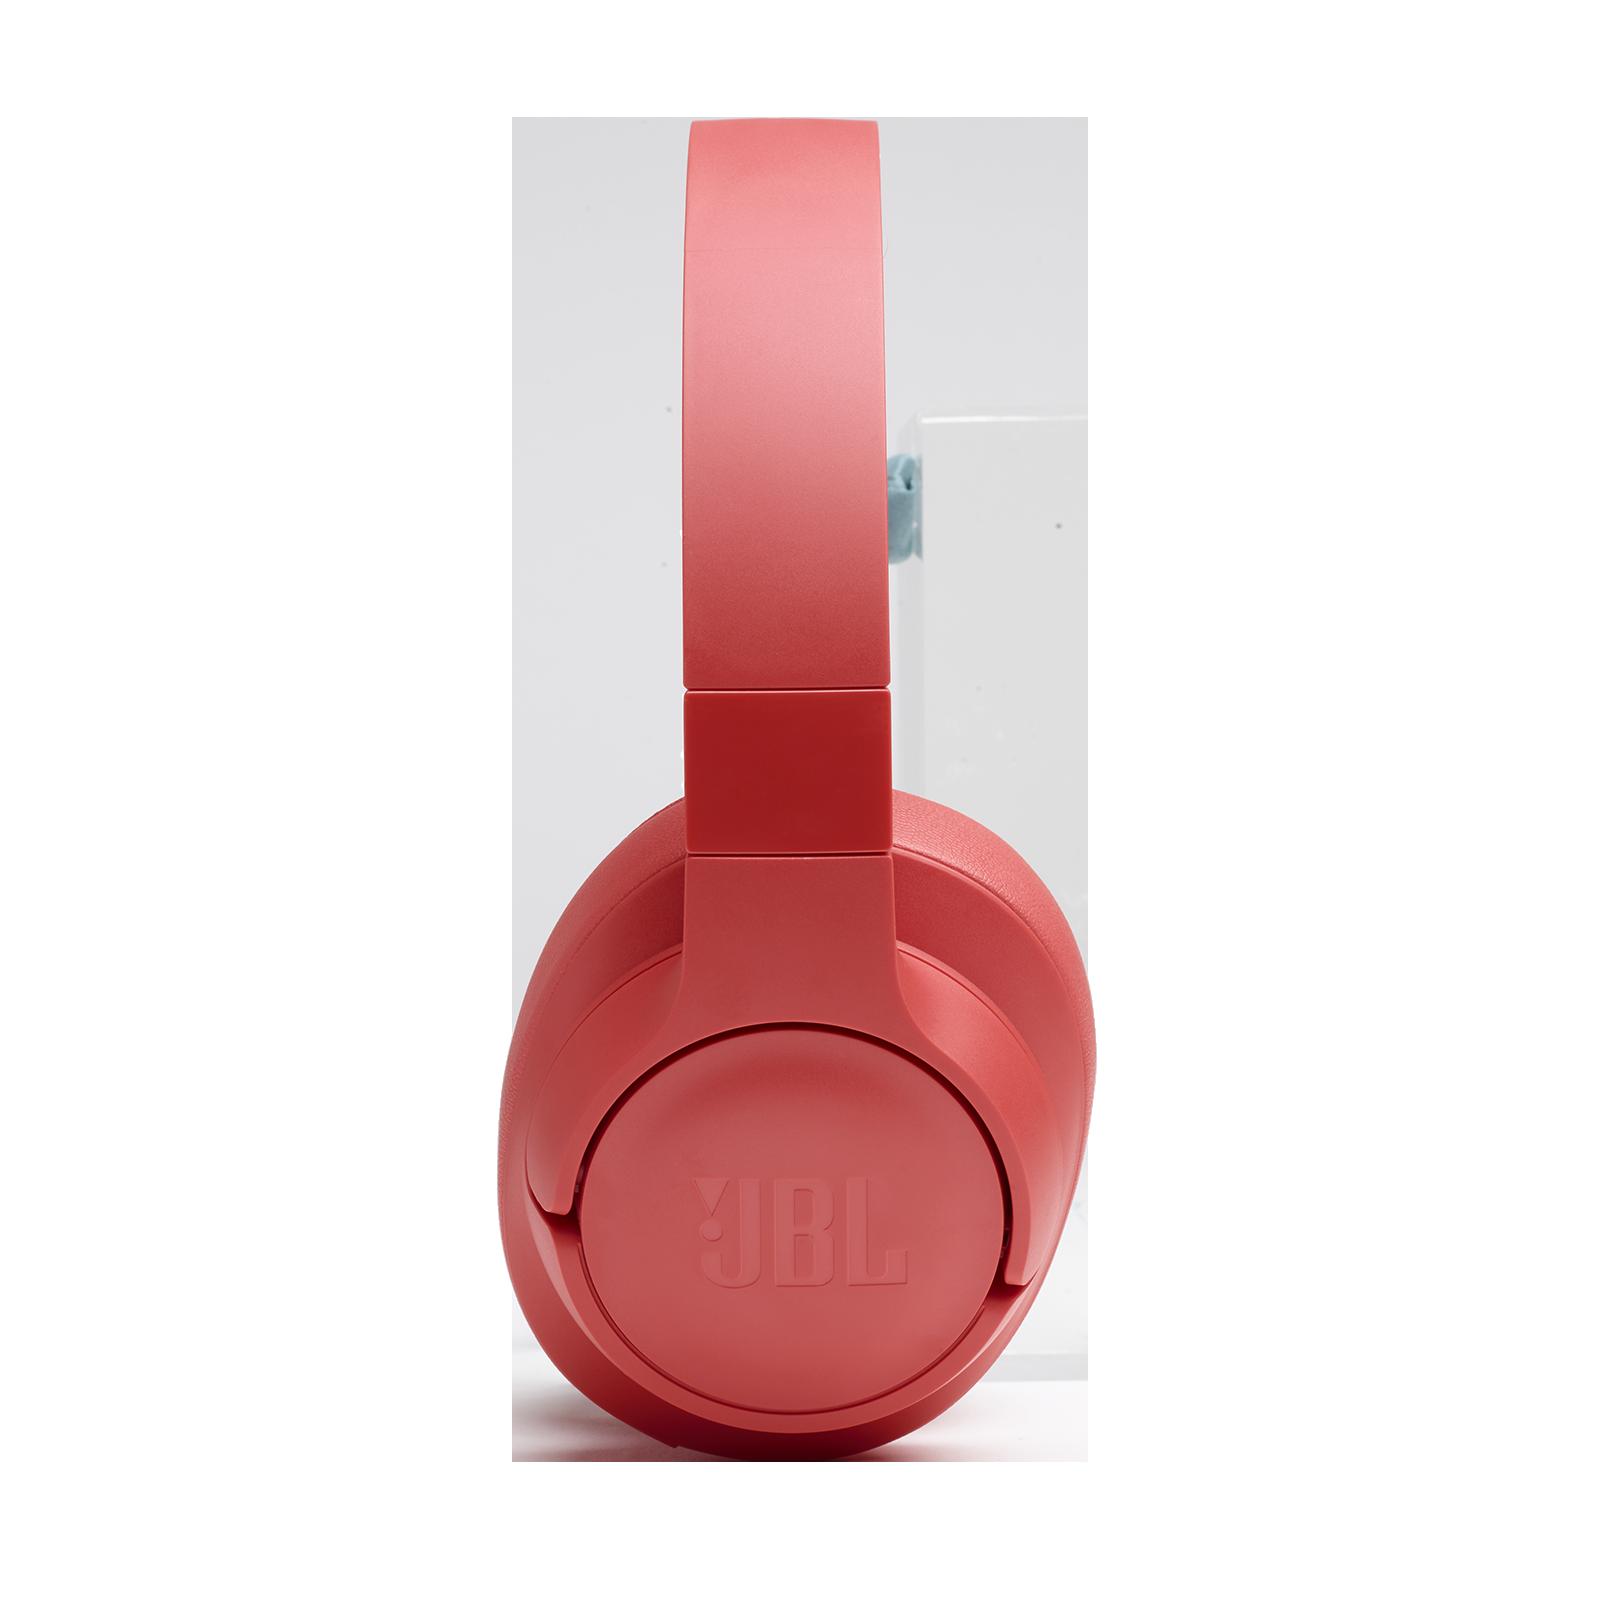 JBL TUNE 700BT - Coral - Wireless Over-Ear Headphones - Detailshot 4